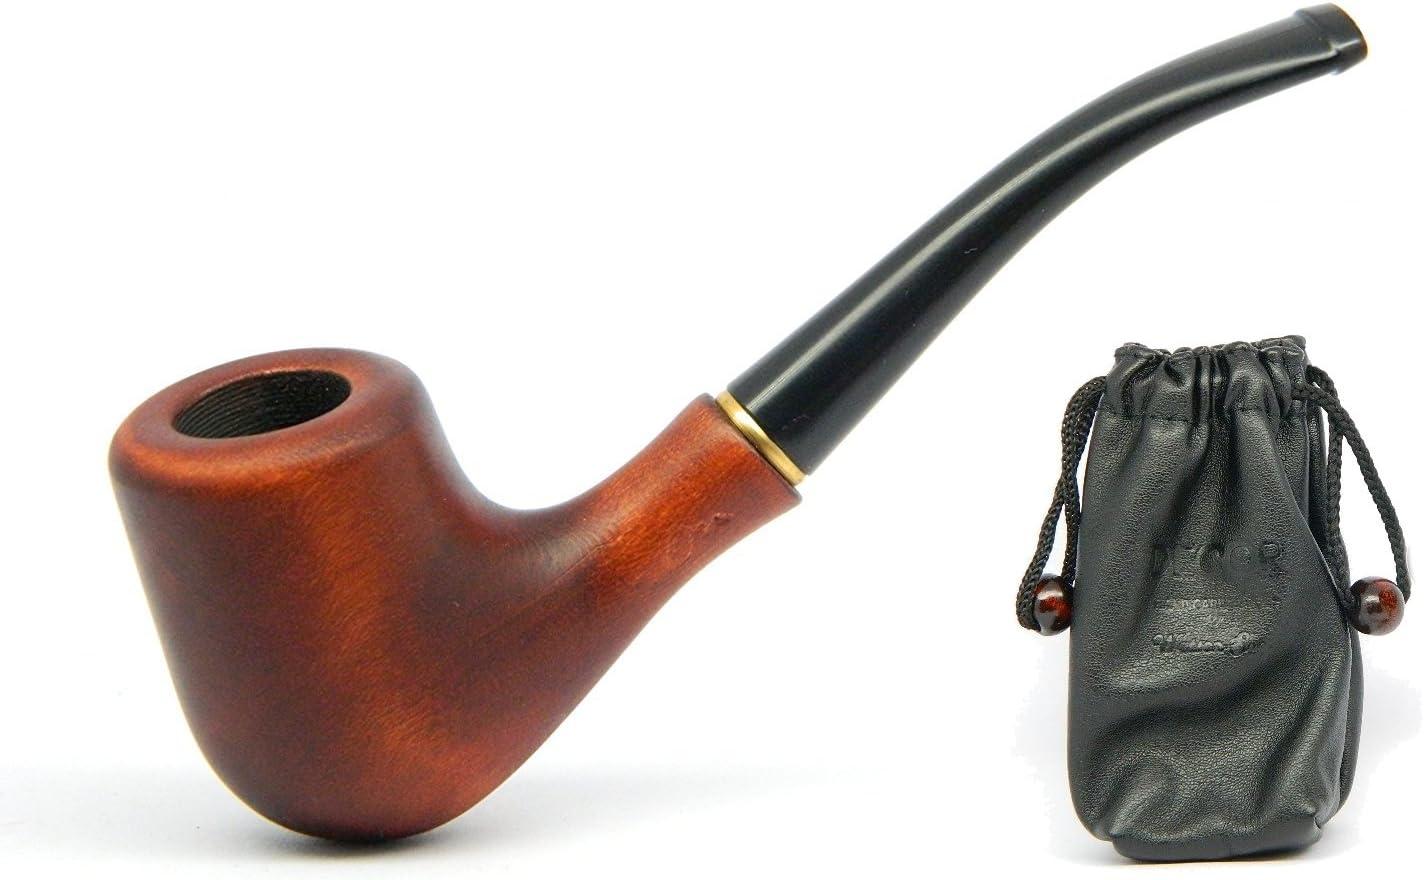 Dr. Watson - Mini Pipa de Fumar de Madera del Tabaco, tallada a mano, viene en caja (Mini)